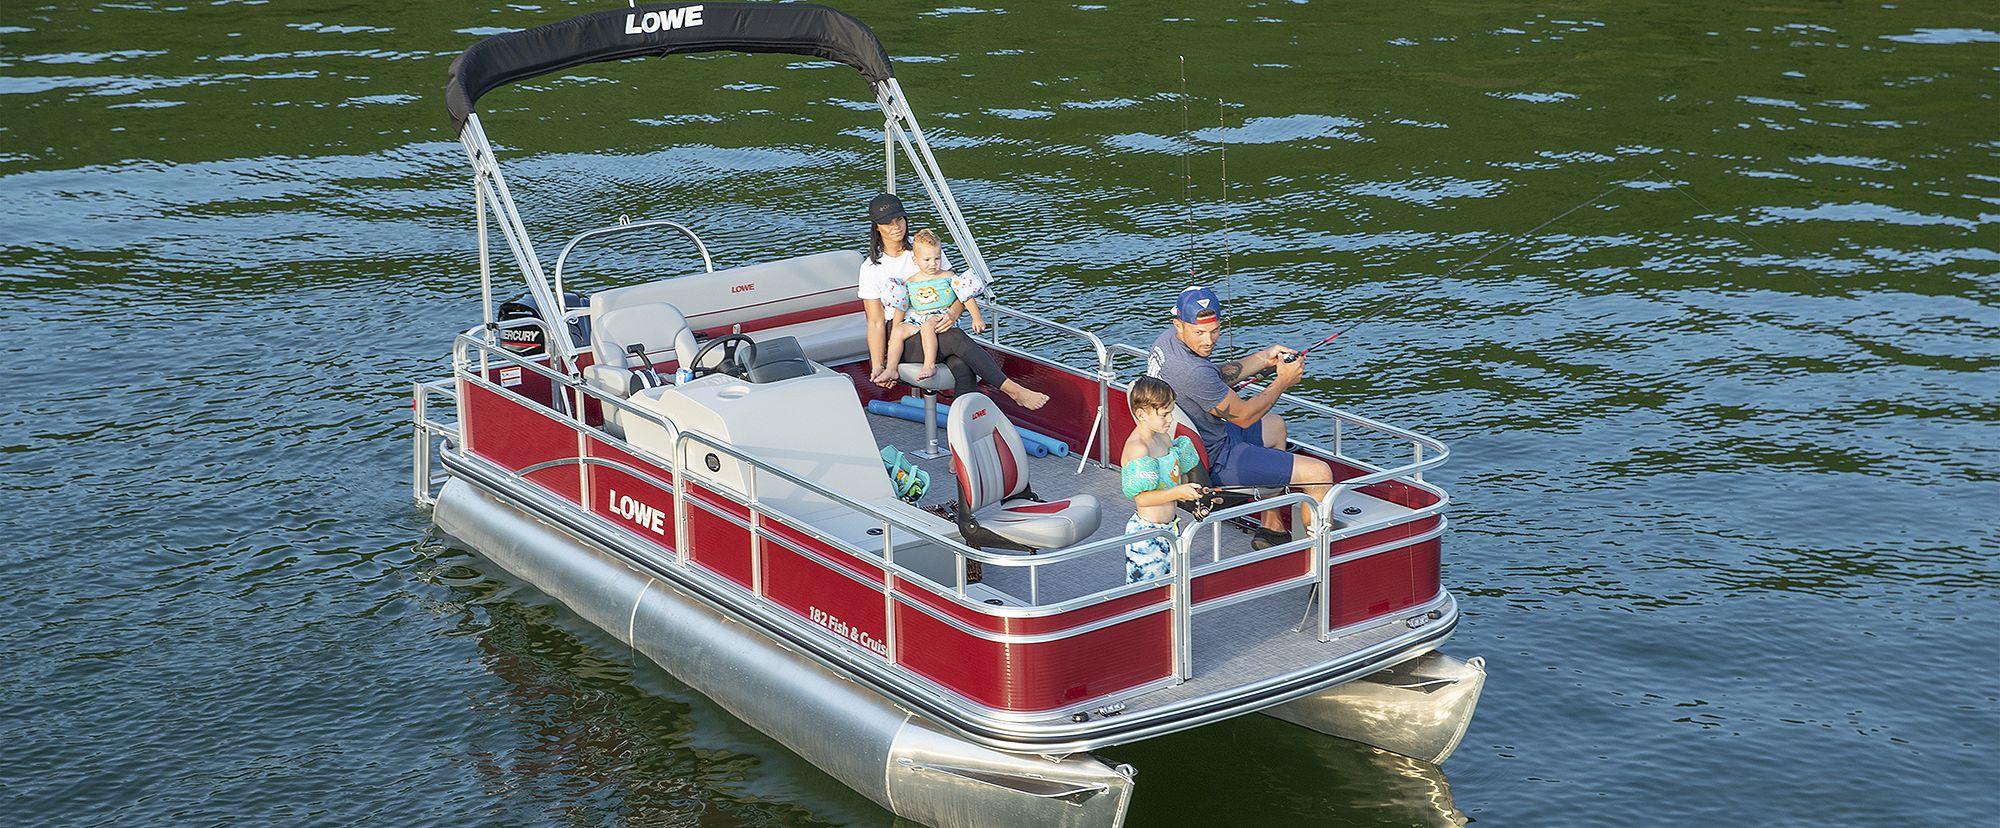 UltraLowe Boats Ultra Hero Image